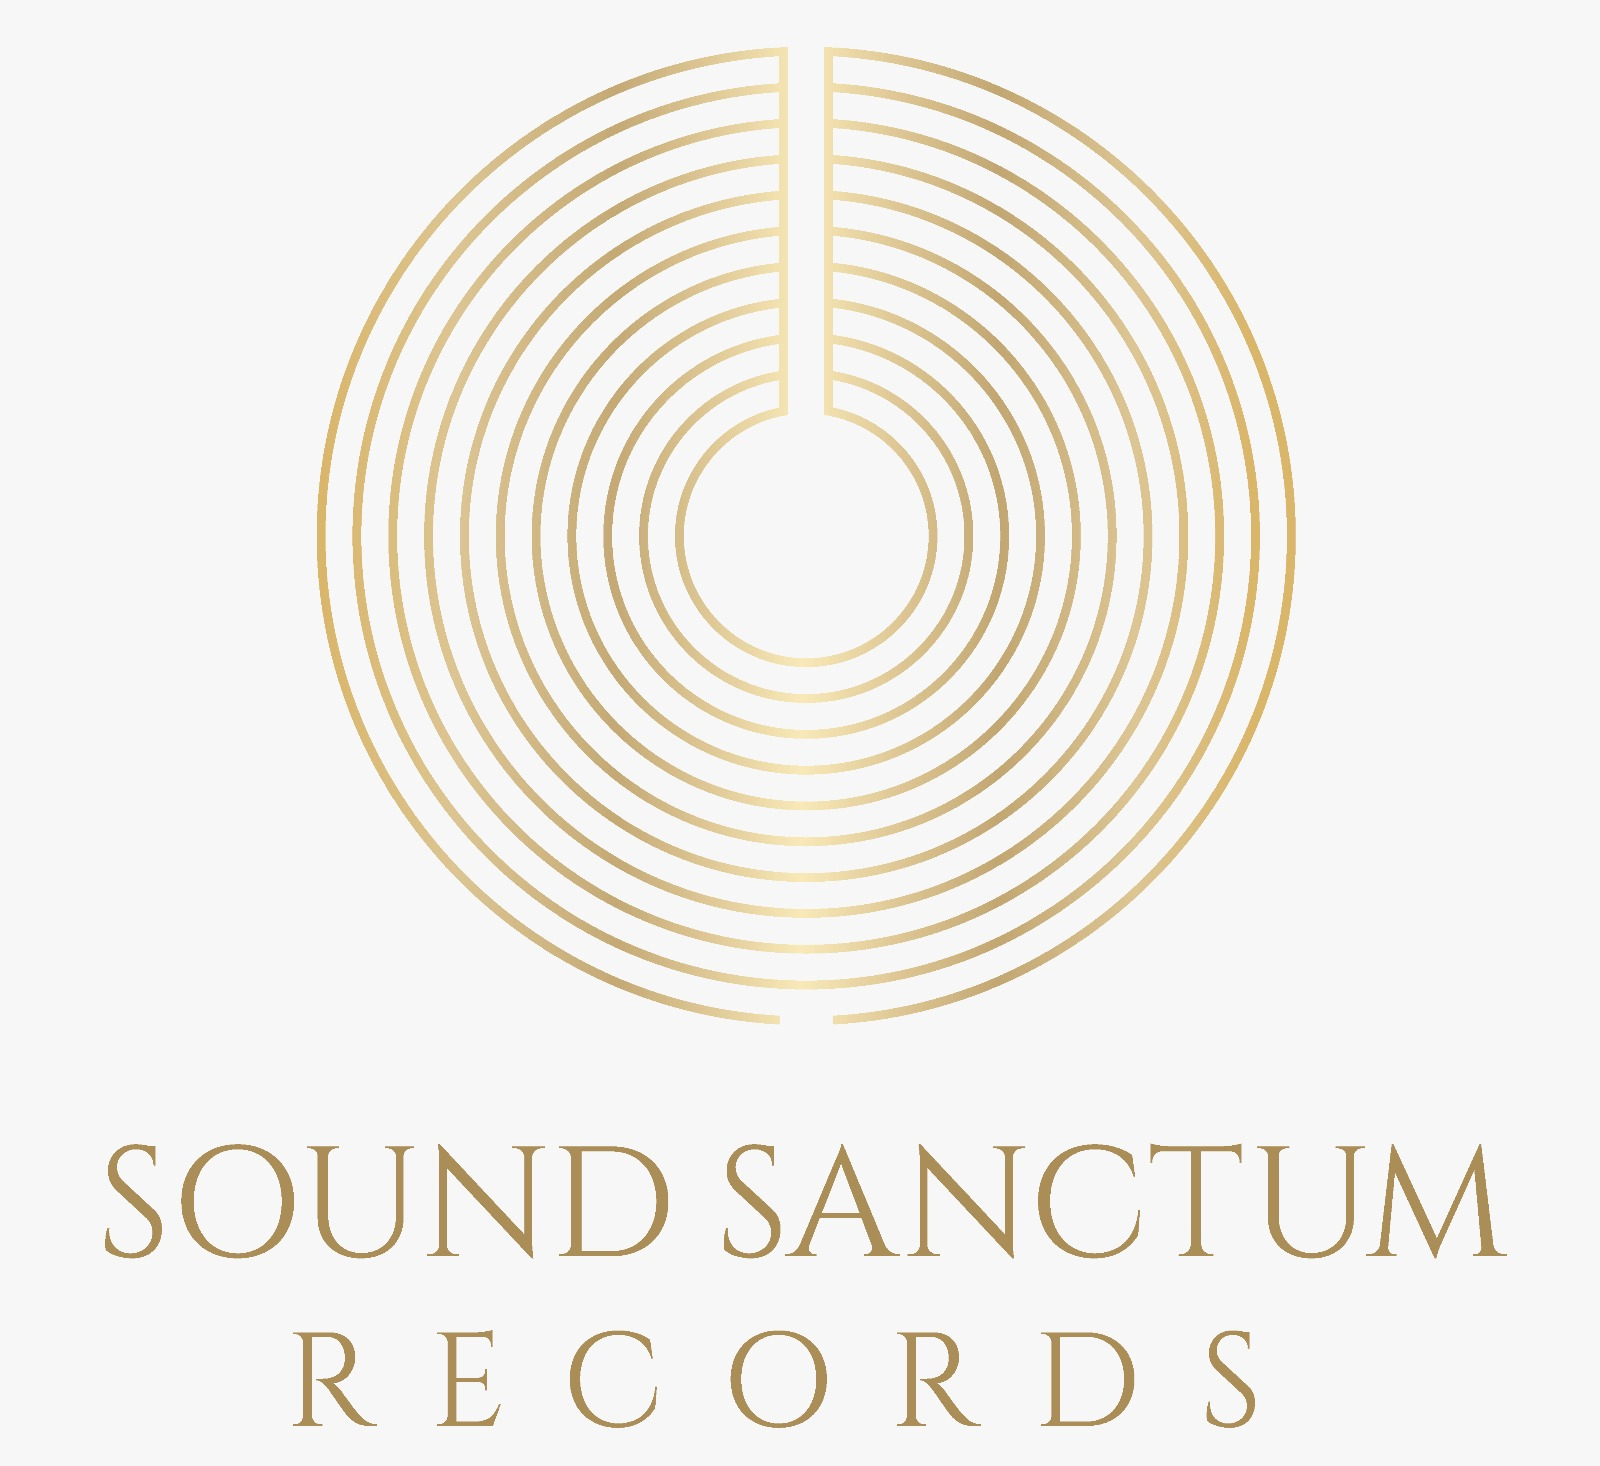 sound sanctum logo copy.jpg